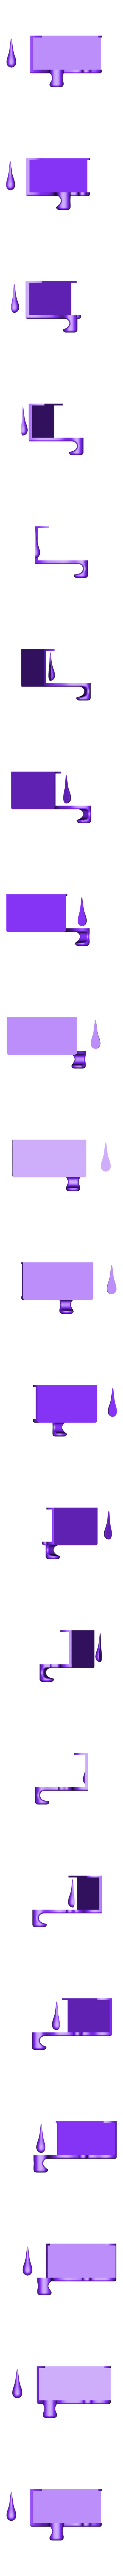 Drip_hanger_35mm.stl Download free STL file Drip Hook • 3D printing template, Pongo